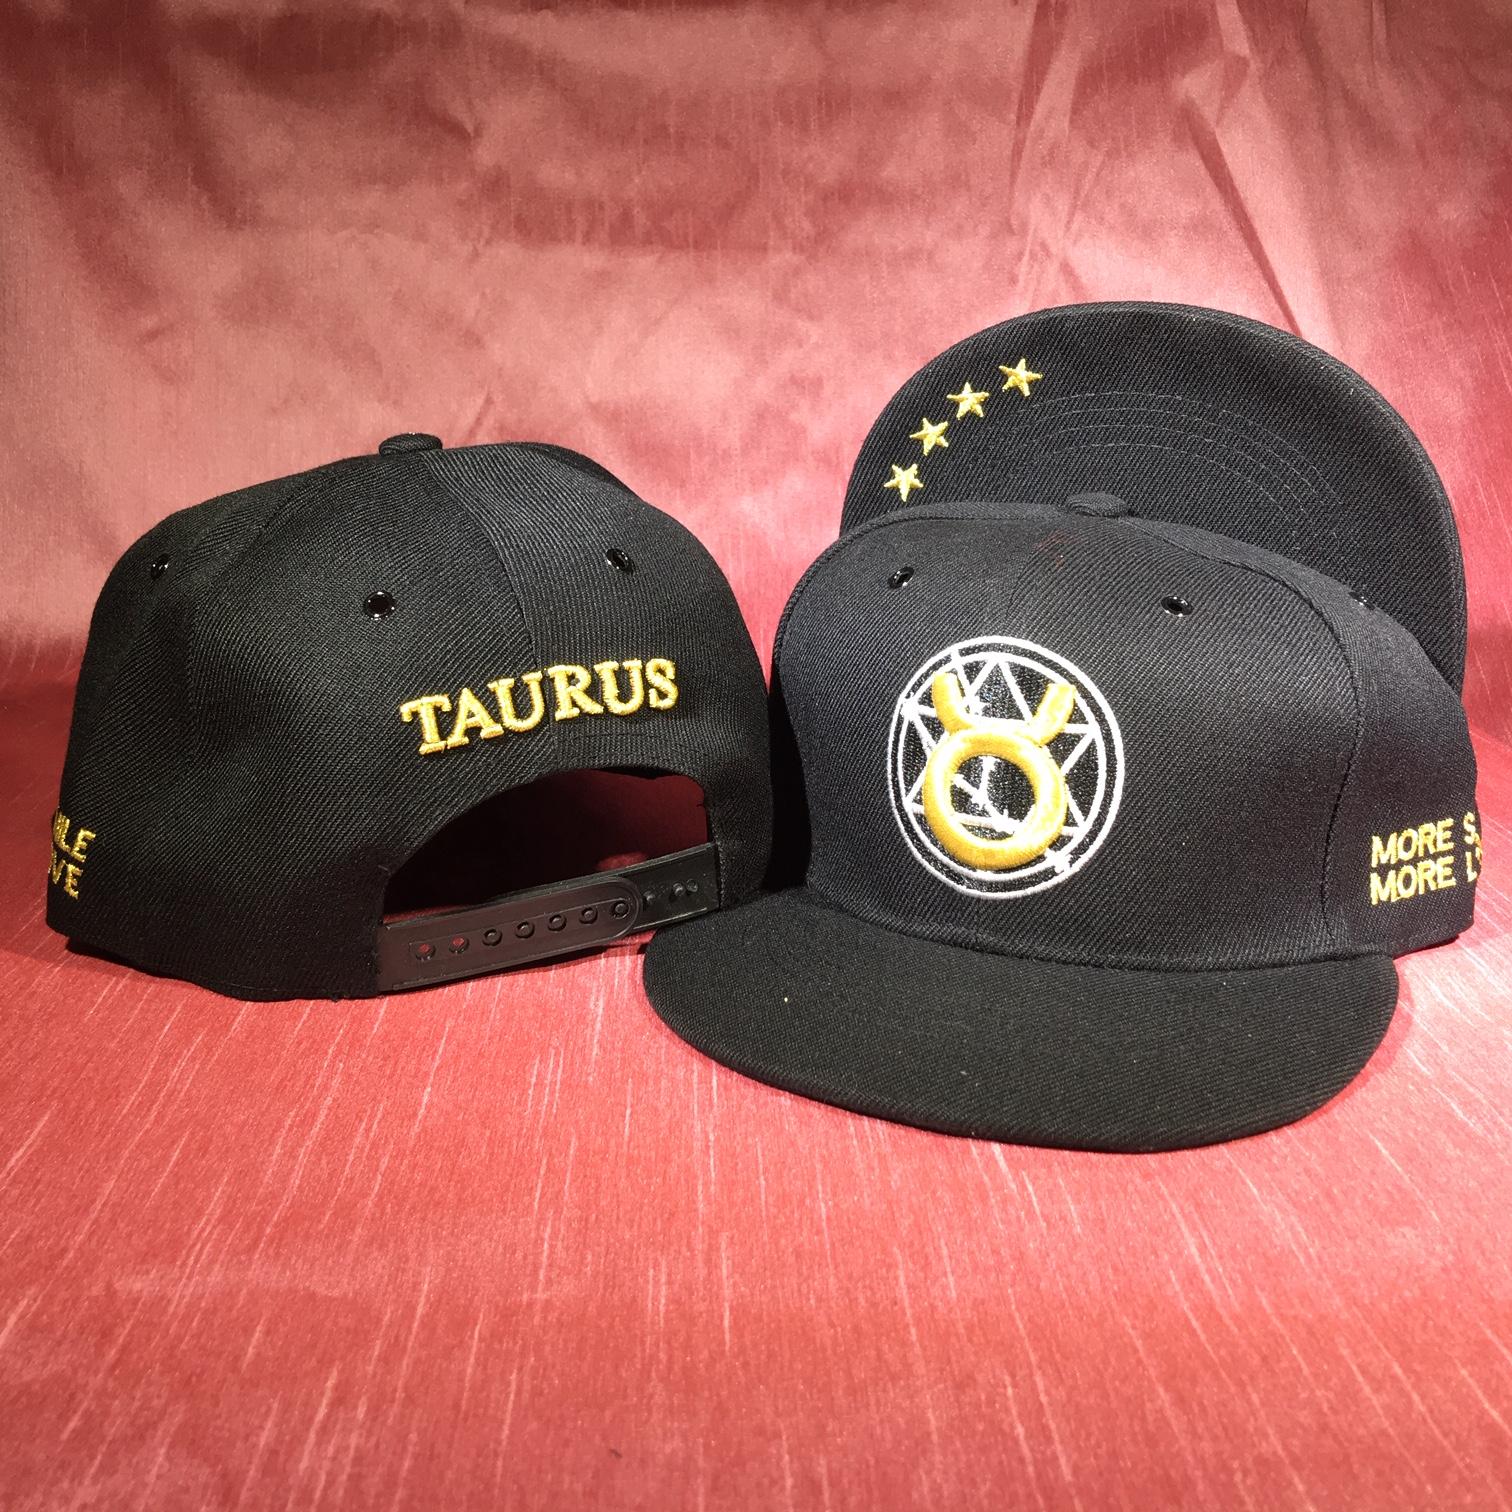 Taurus Flat Back Baseball Cap   (April 20 to May 20)